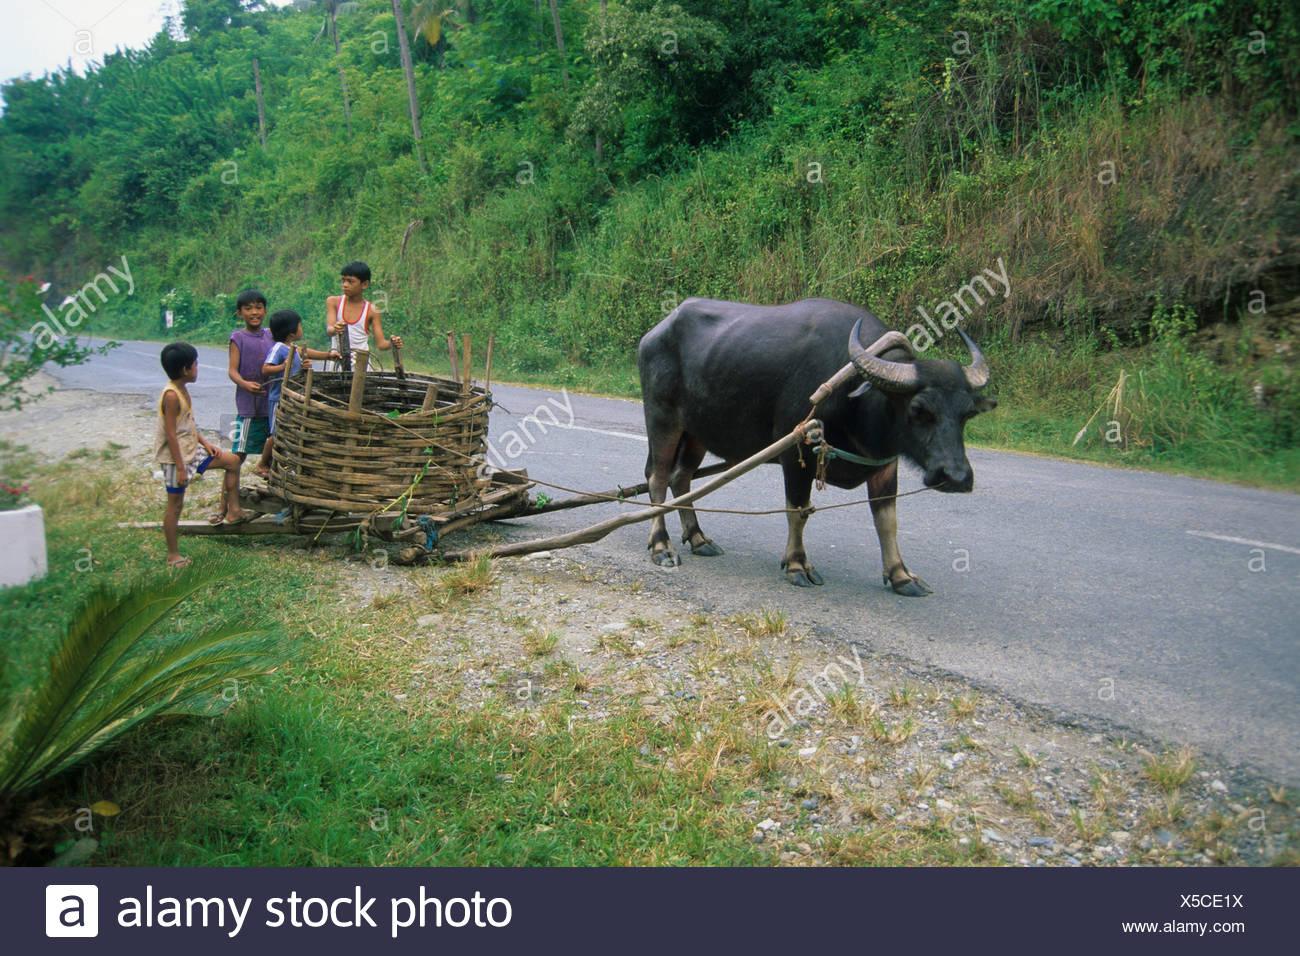 Carabao (Bubalus bubalis), domesticated water buffalo, used to transport coconuts, Puerto Galera, Mindoro, Philippines, Asia - Stock Image